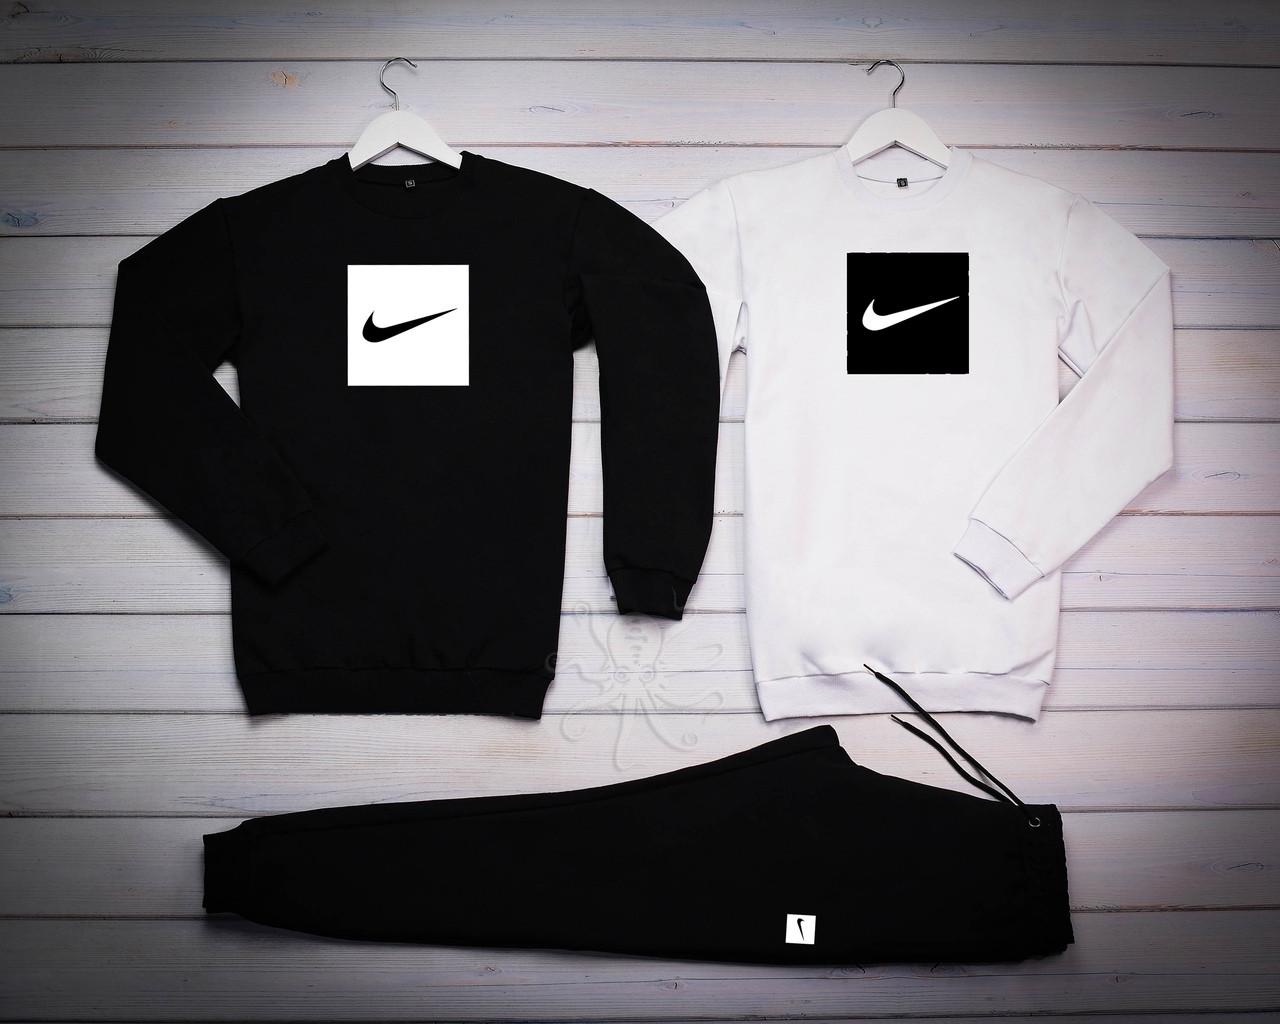 Nike Fri Mужской белый спортивный костюм осень/весна.Nike Свитшот 2шт+штаны. Мужской спорт комплект